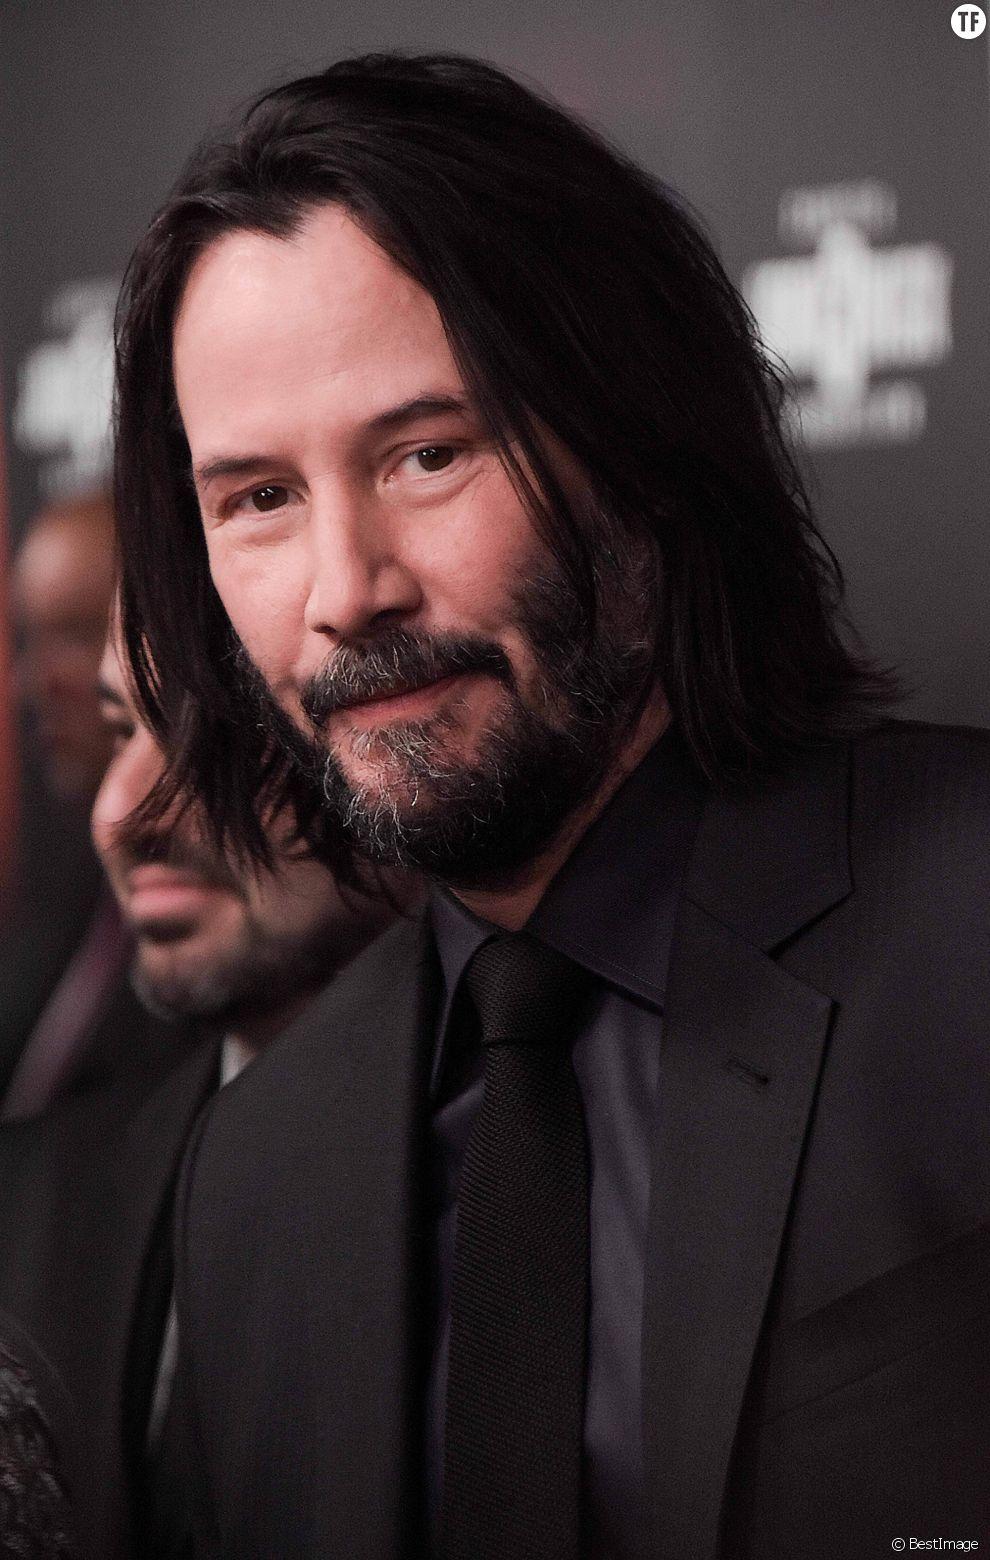 Keanu Reeves lors de la première de John Wick Parabellum à New York le 9 mai 2019.